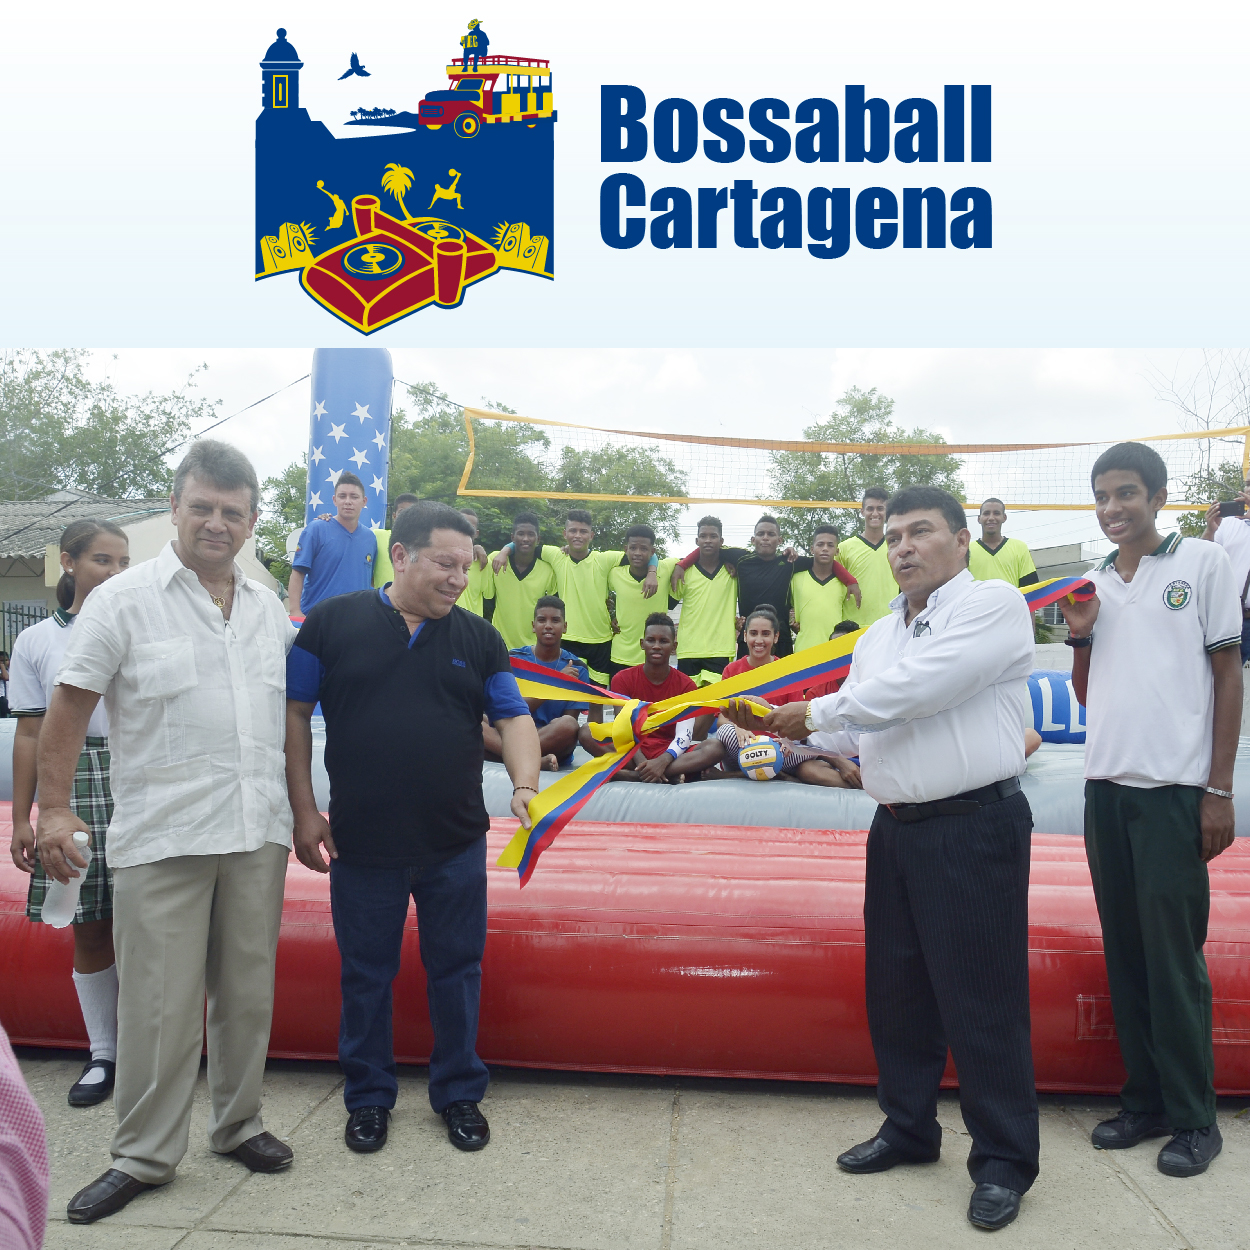 Bossaball Colombia Cartagena Educacion innovacion deportiva